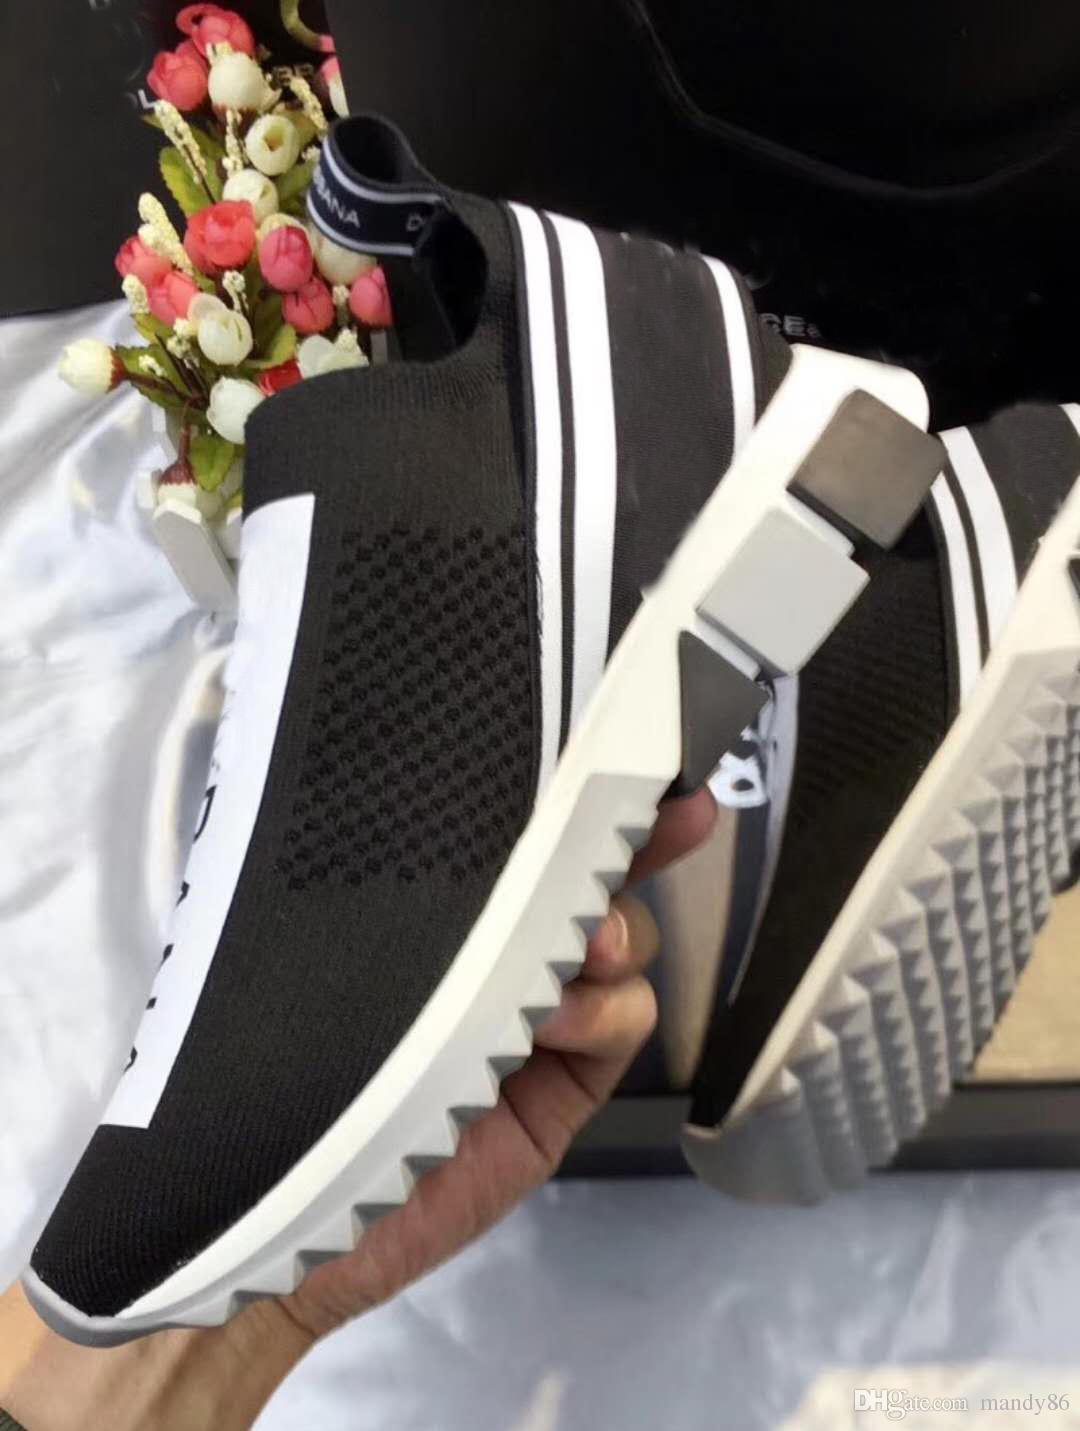 a48ca4ee604 2018 Fashion Stretch Women Shoes Woman Sneakers Casual Shoes Zapatillas  Deportivas Sapatos Femininos Sapatilha Alphabet Series Blue Shoes Clogs For  Women ...